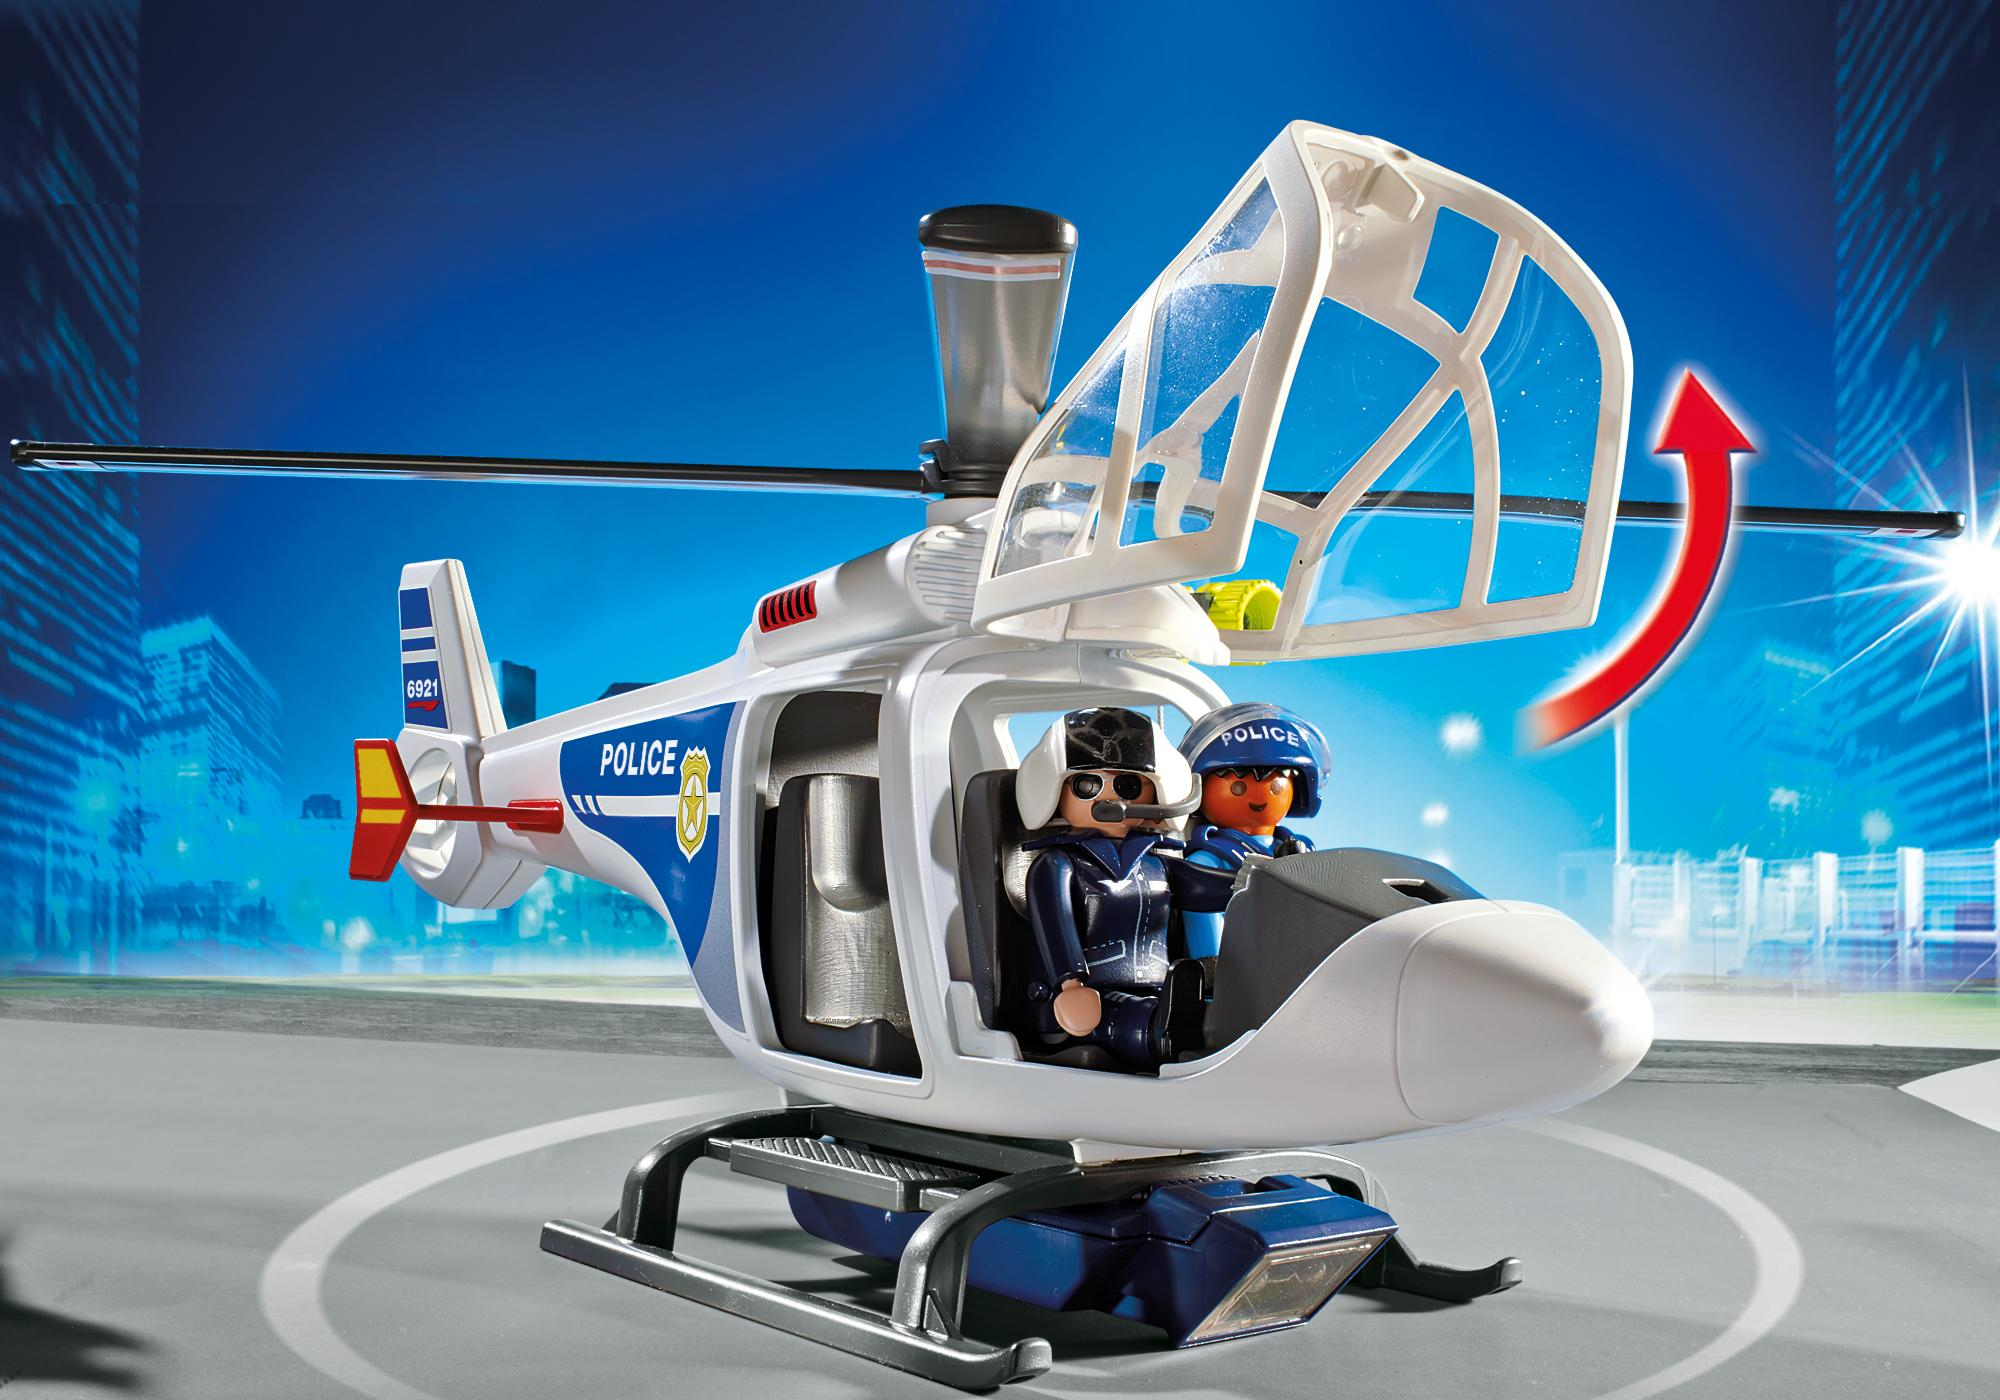 http://media.playmobil.com/i/playmobil/6921_product_extra1/Politiehelikopter met LED-zoeklicht